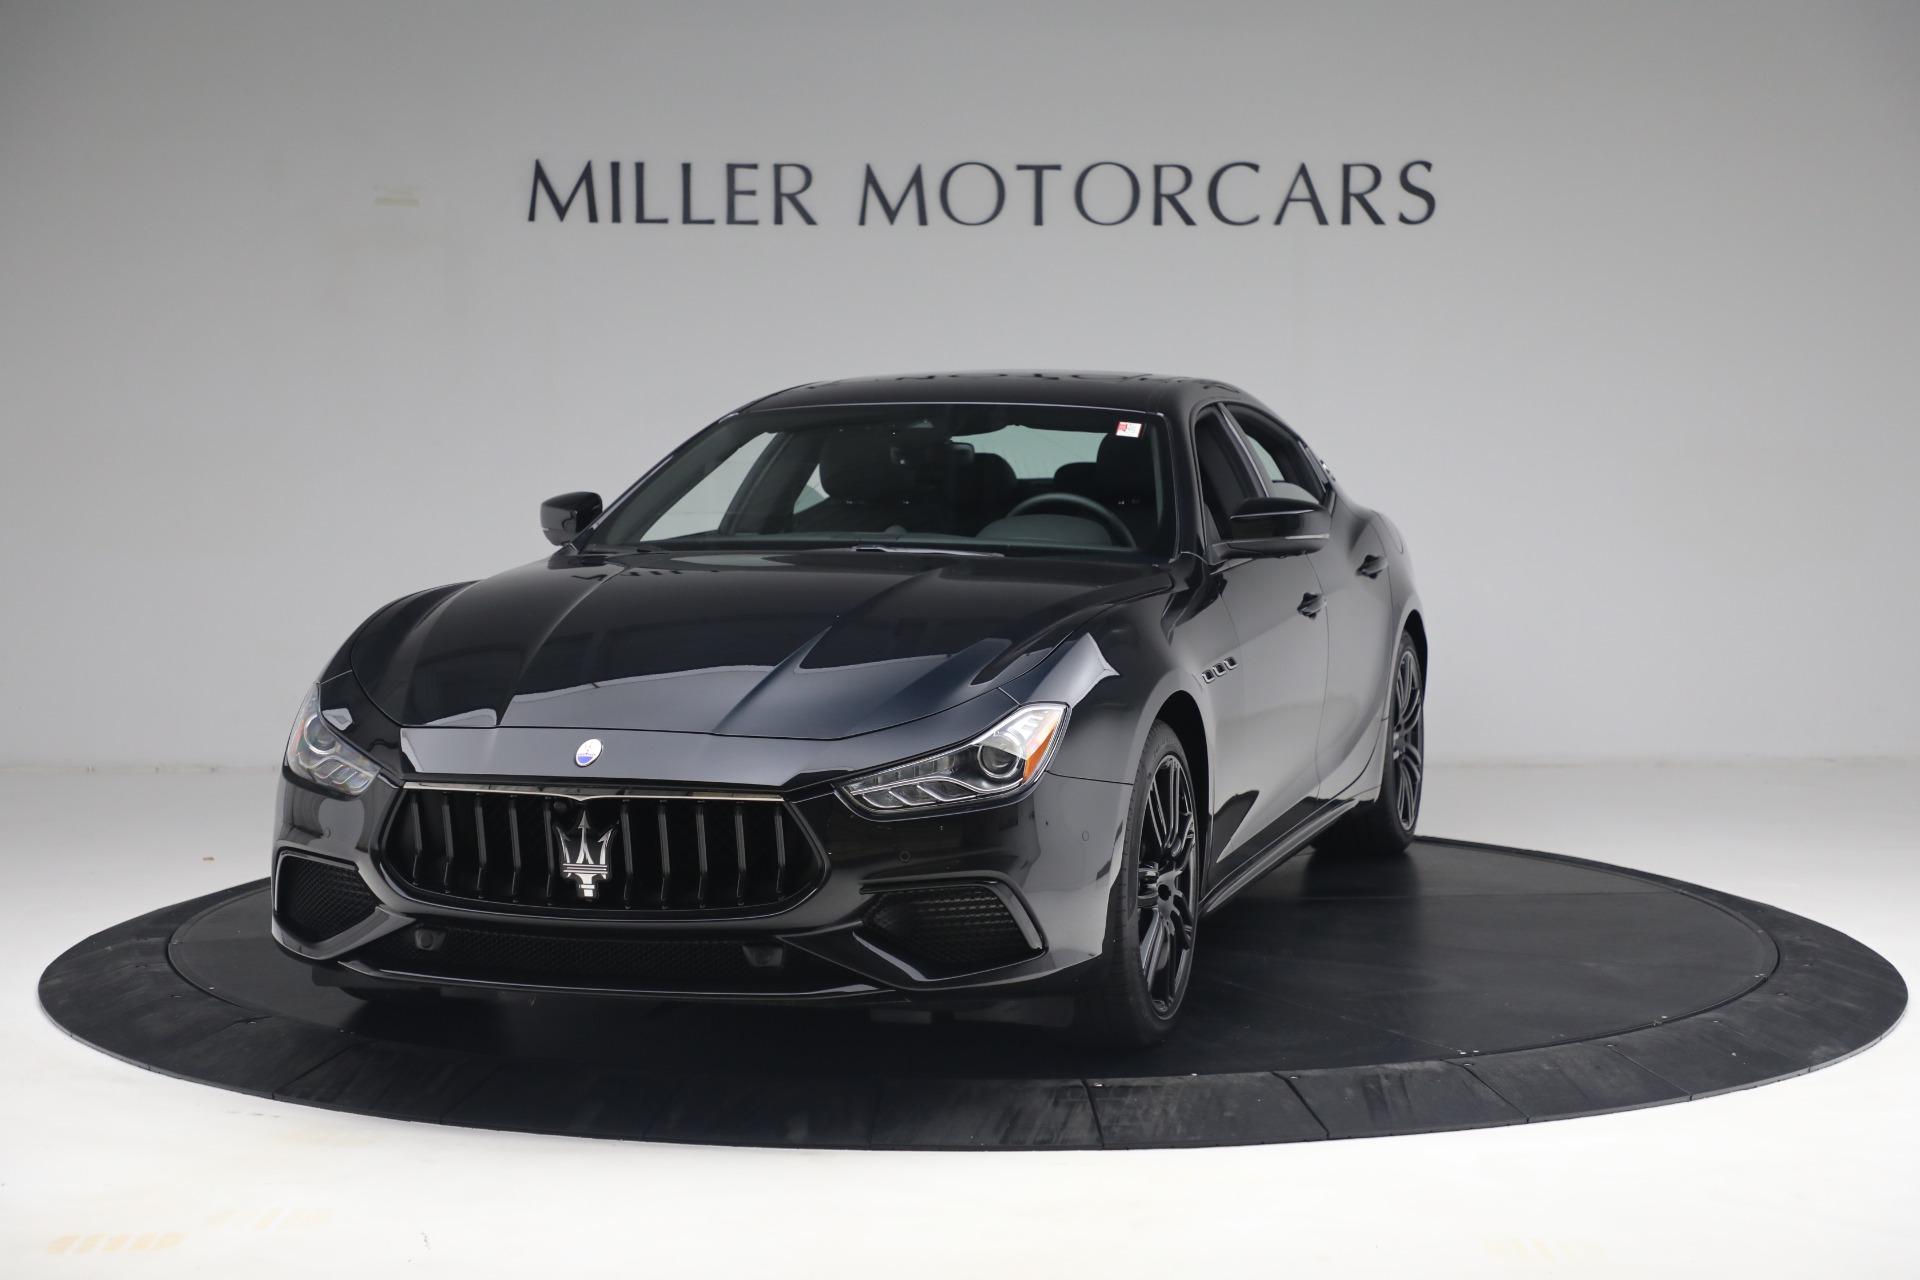 New 2021 Maserati Ghibli SQ4 for sale $92,894 at McLaren Greenwich in Greenwich CT 06830 1